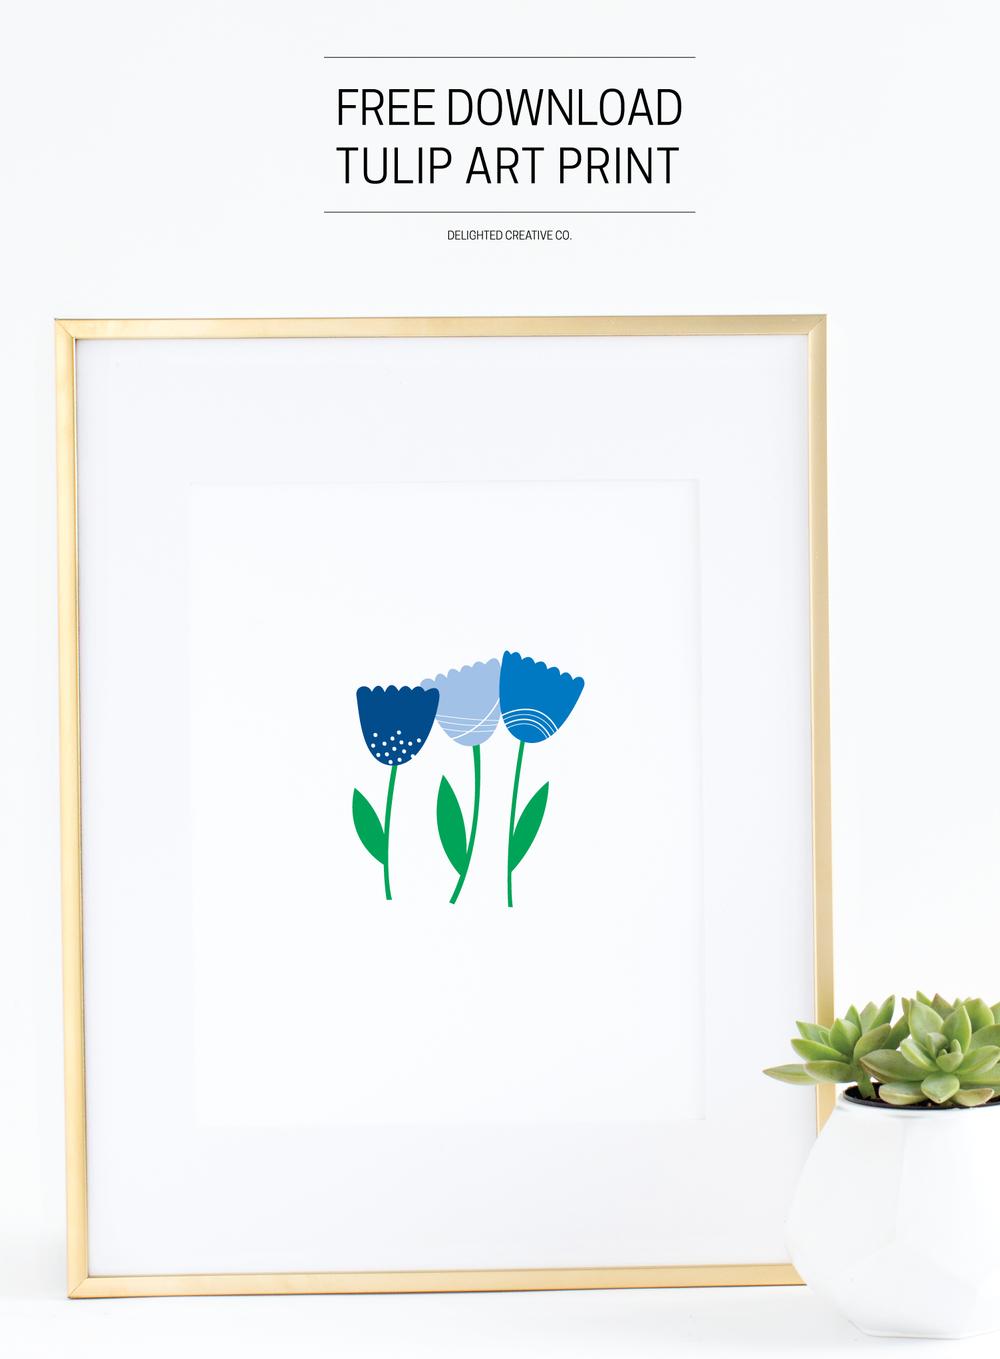 Free Download: Tulip Art Print | Amanda Gomes •Delighted Creative Co.